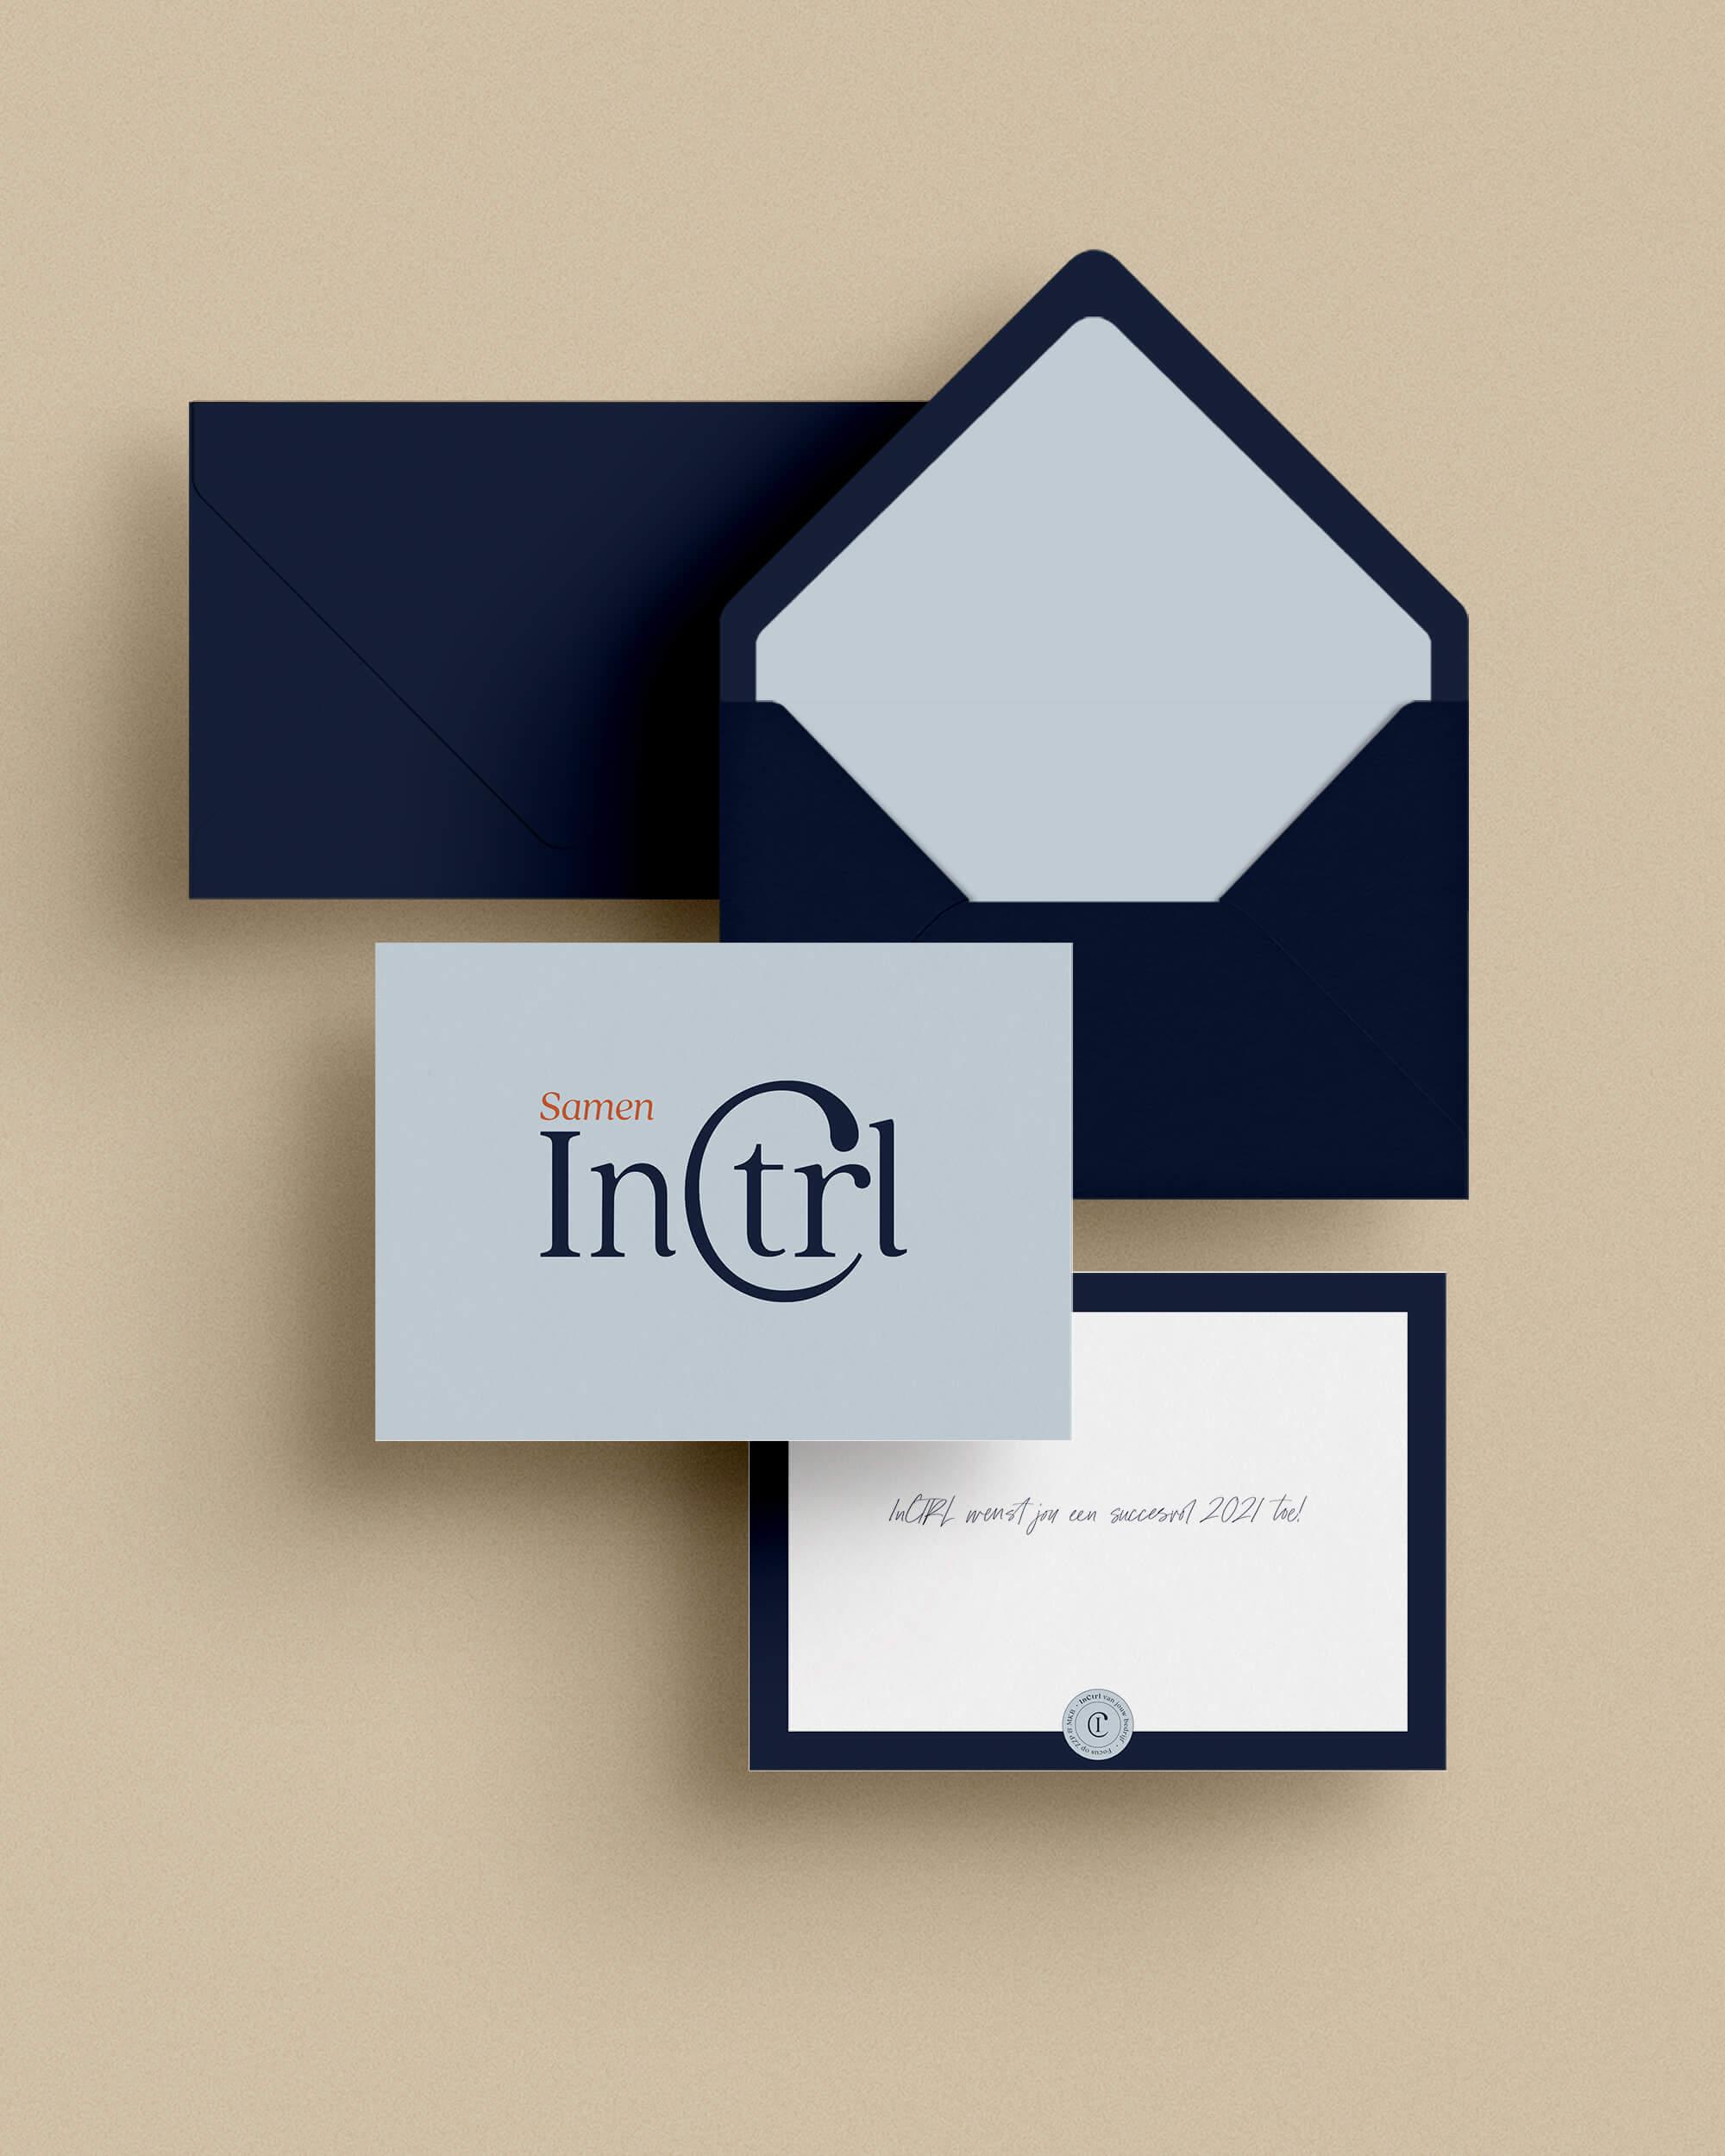 InCTRL Corporate brand Identity | Fiona Gobbo Creative | InCTRL stationary mock-up